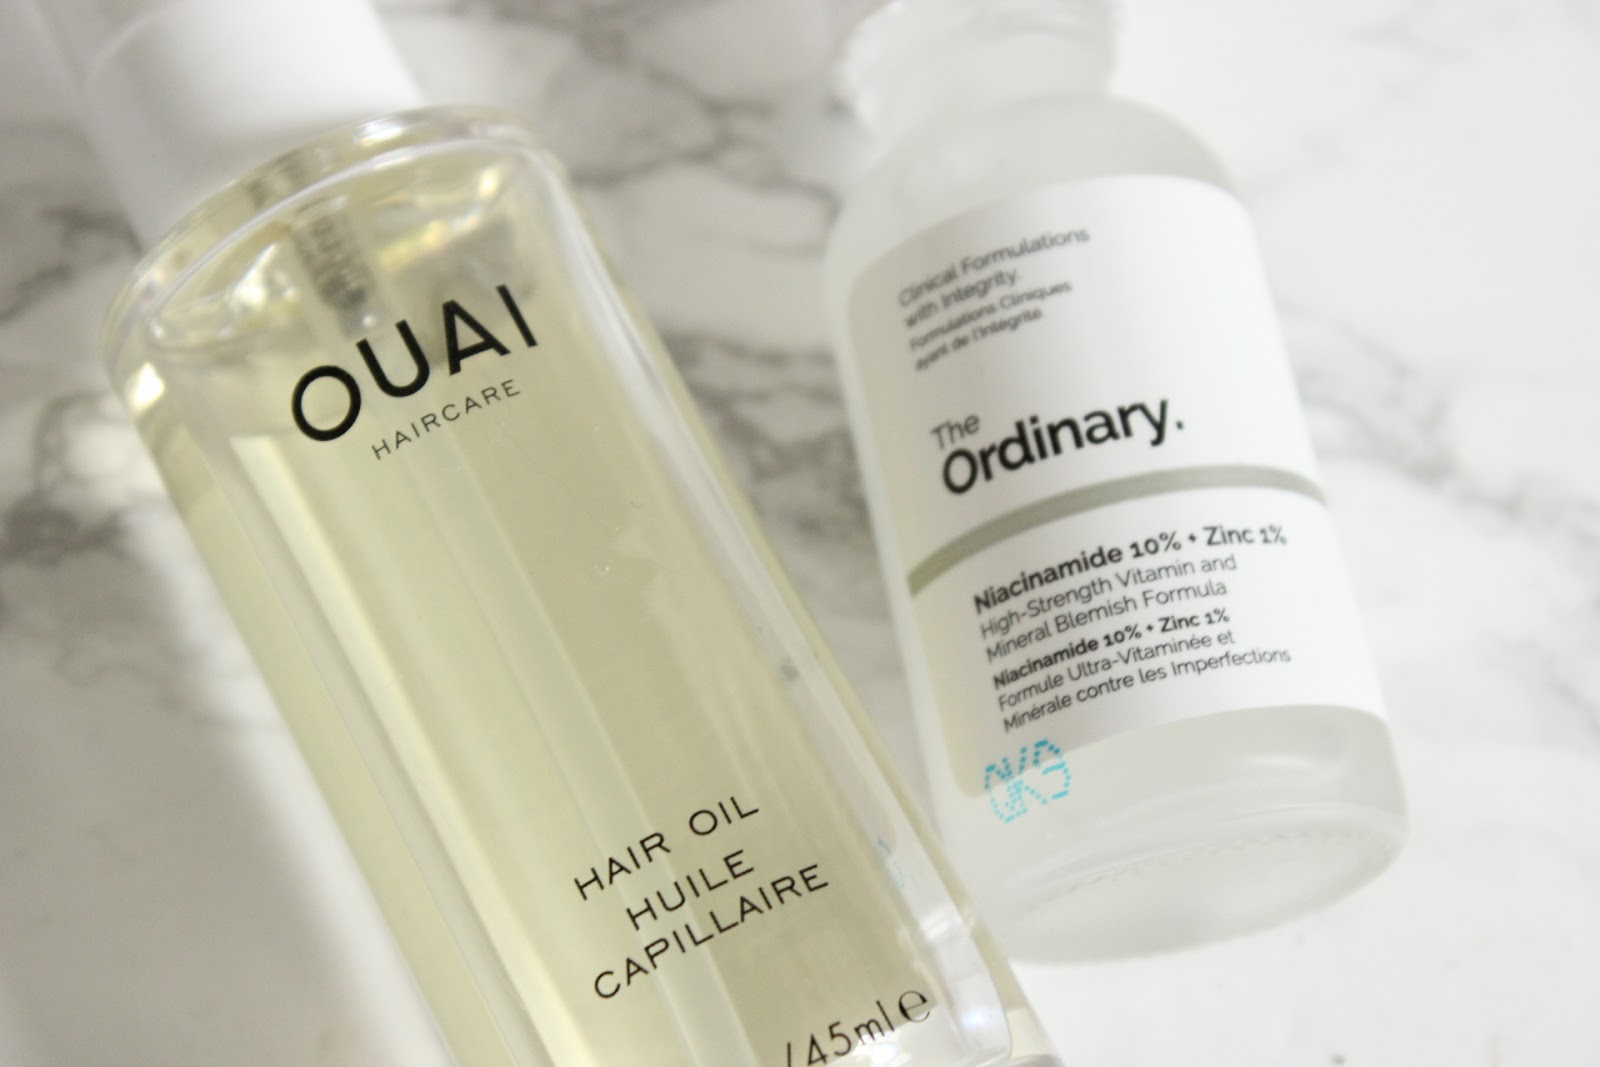 October Favourites - Ouai Hair Oil, The Ordinary Niacinamide & Zinc